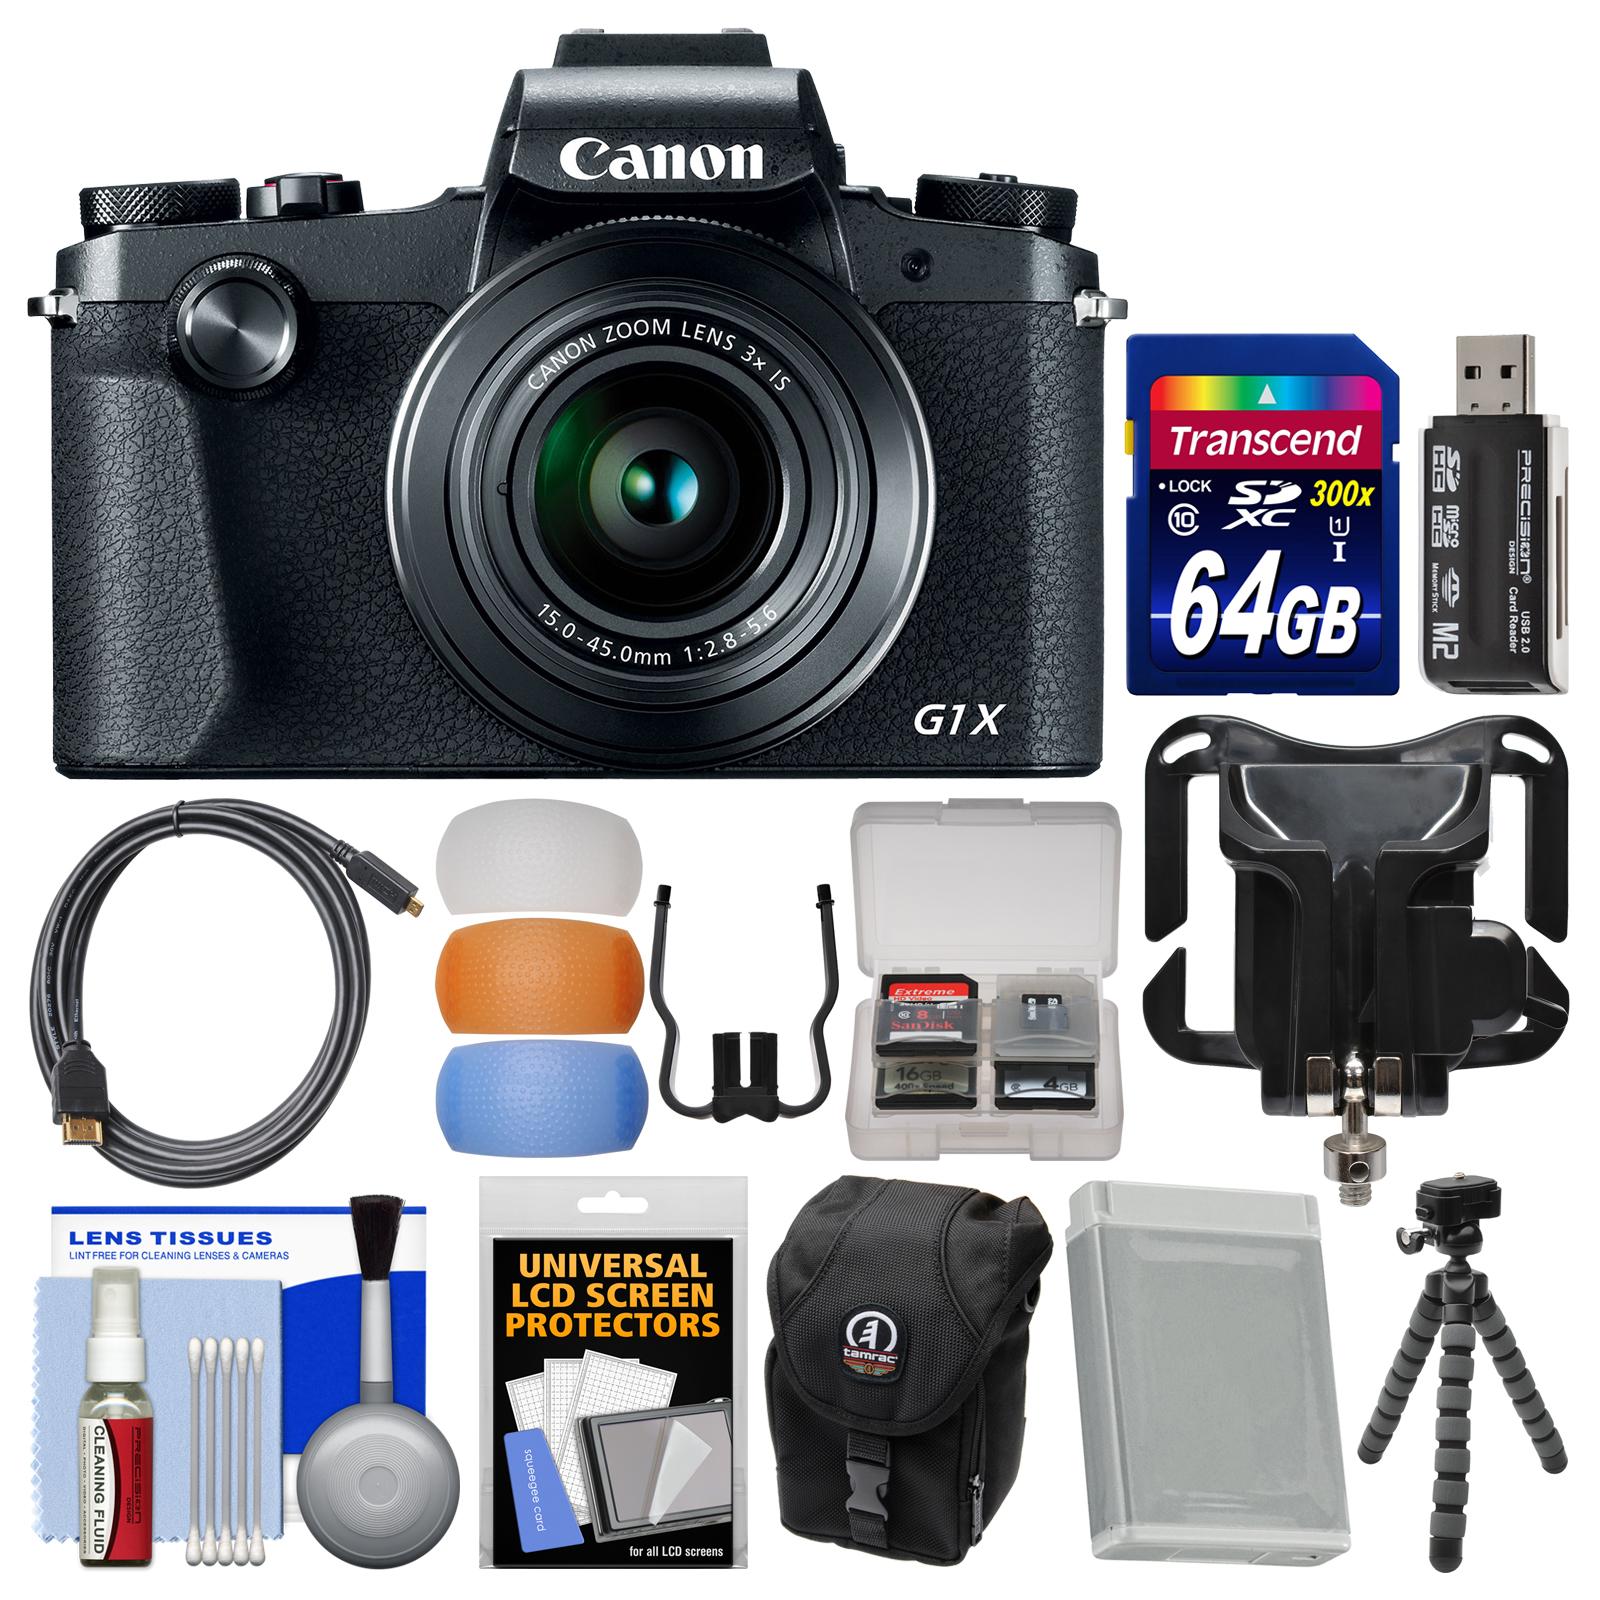 Canon PowerShot G1 X Mark III Wi-Fi Digital Camera with 6...